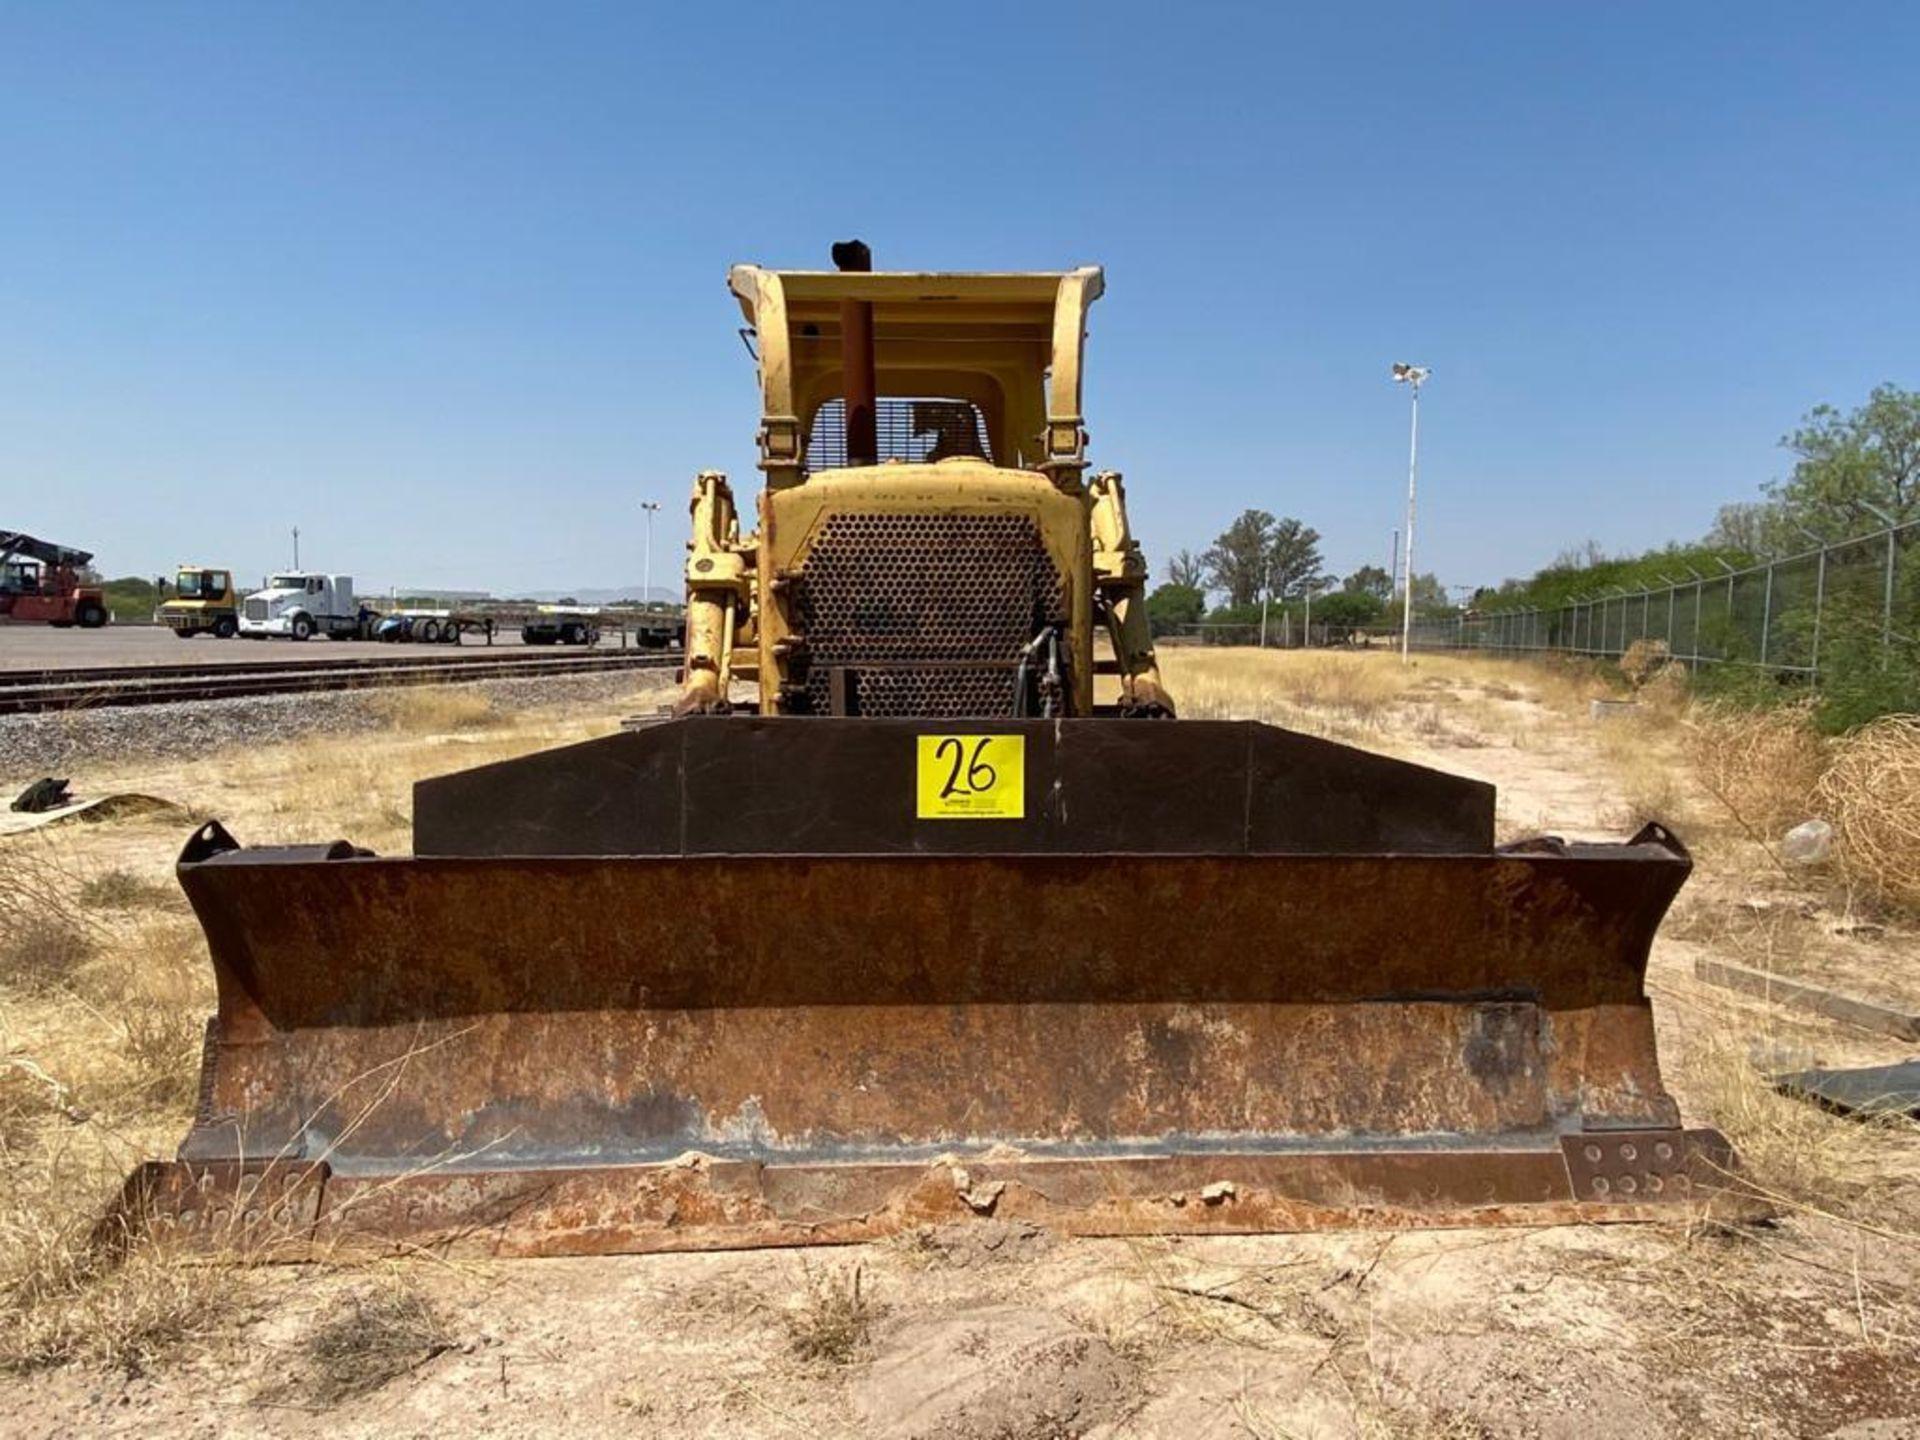 Caterpillar D7G Bulldozer, Serial number 92V5897, Diesel motor - Image 4 of 48